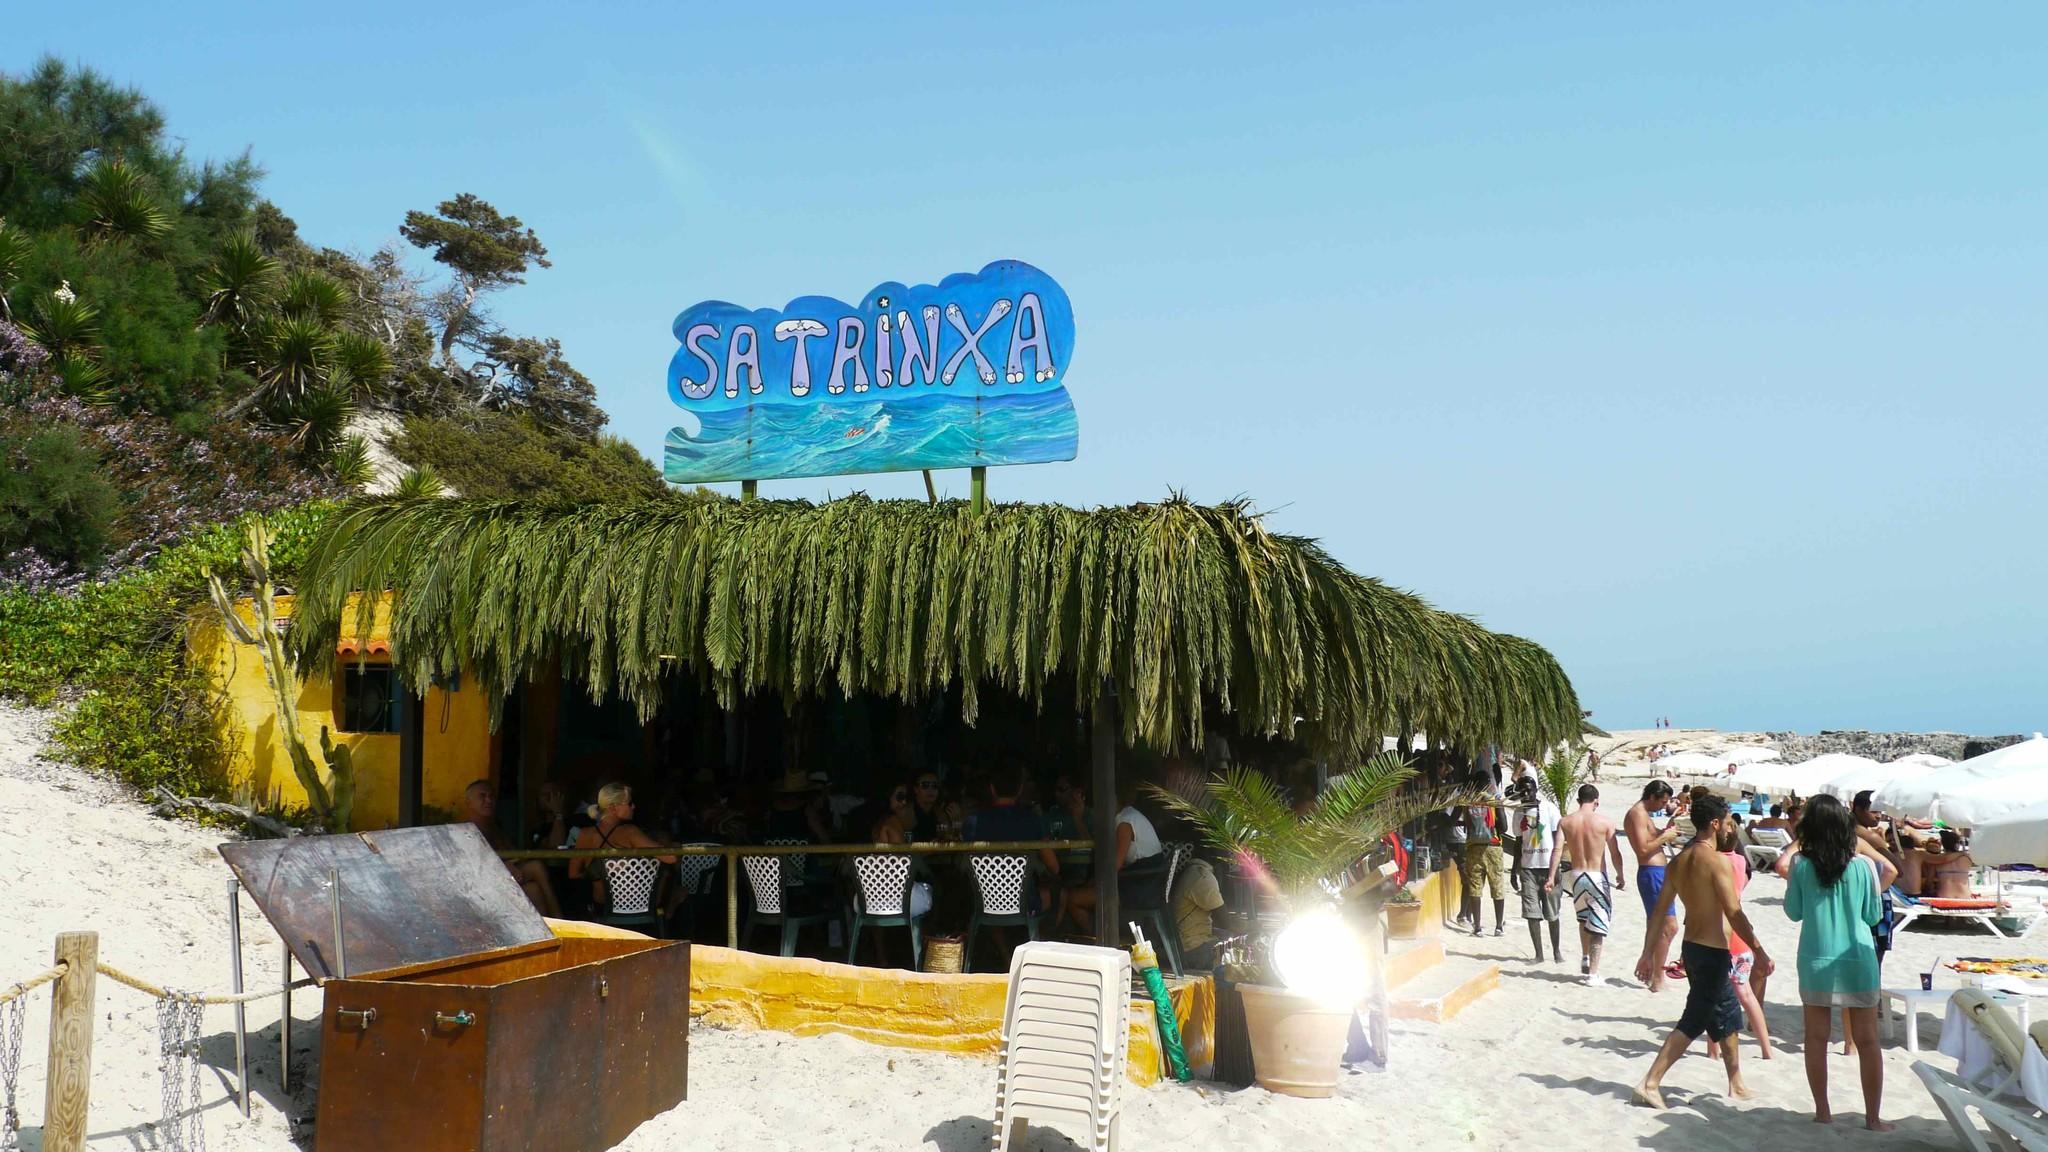 Our favorite places in Ibiza - Sa Trinxa